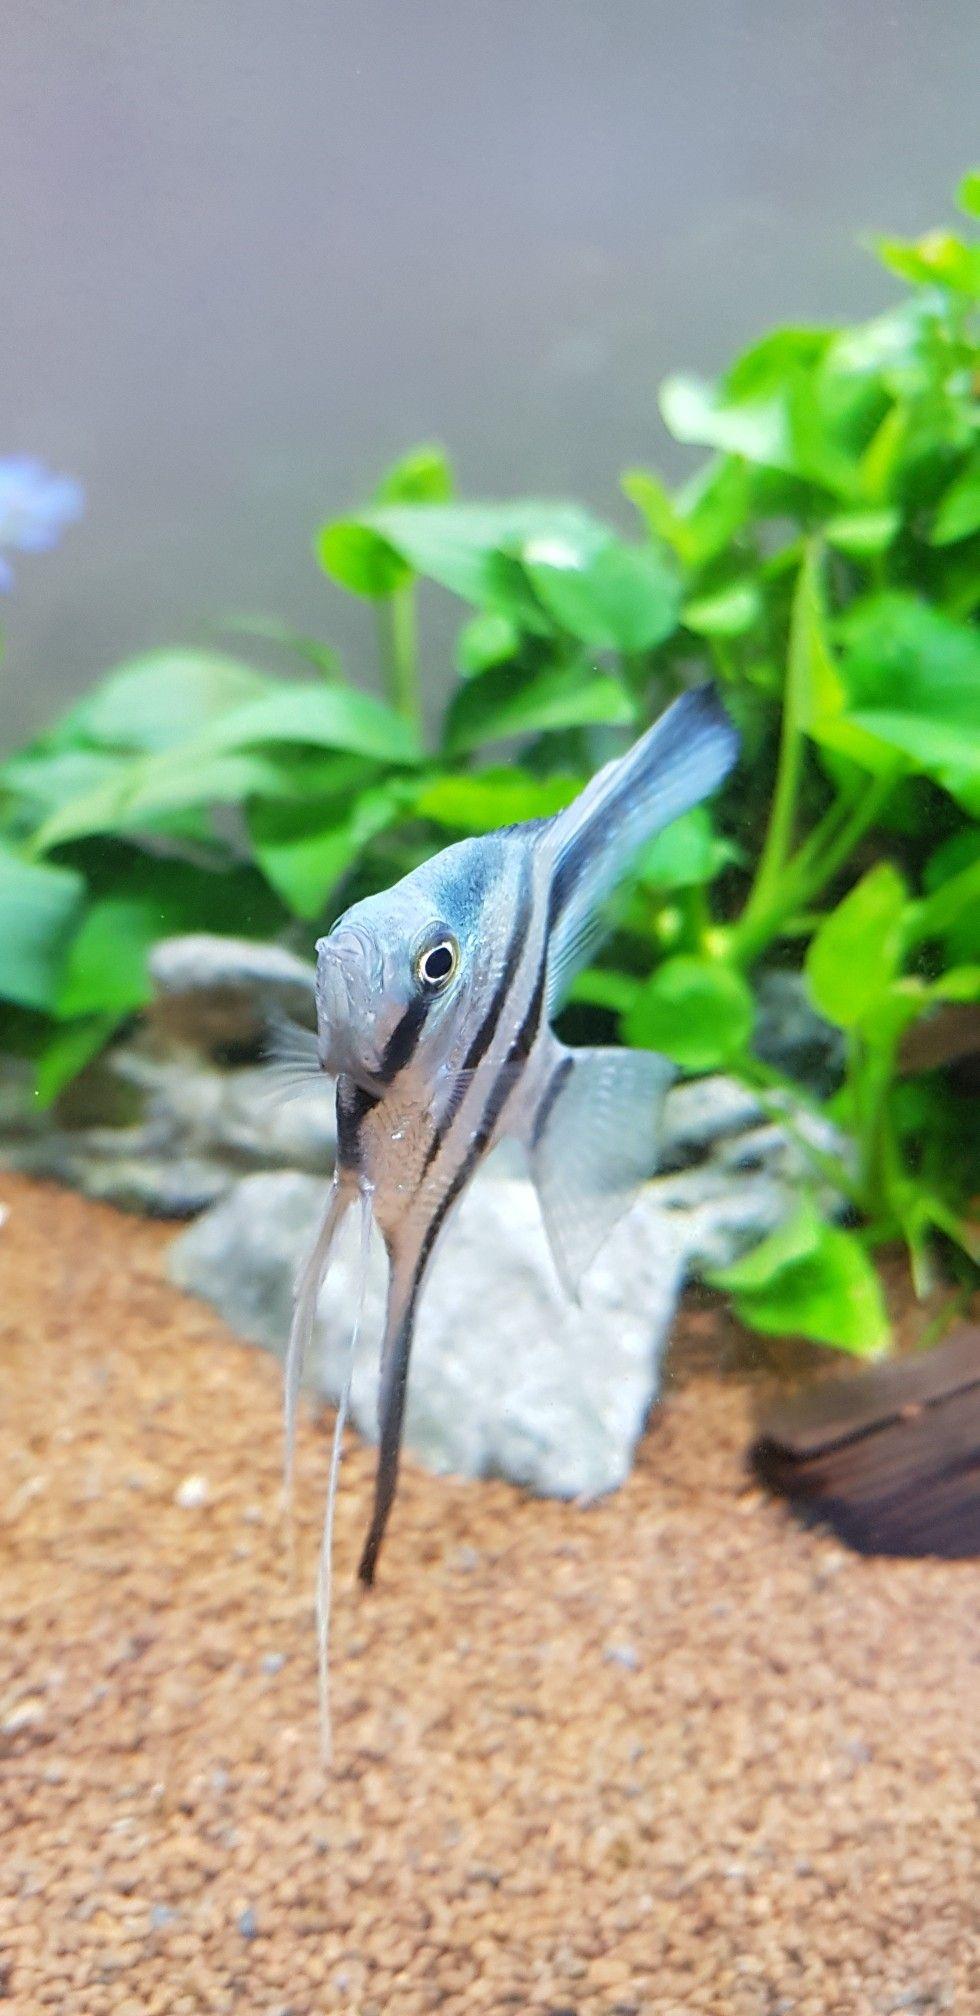 Manfish Hewan Ikan